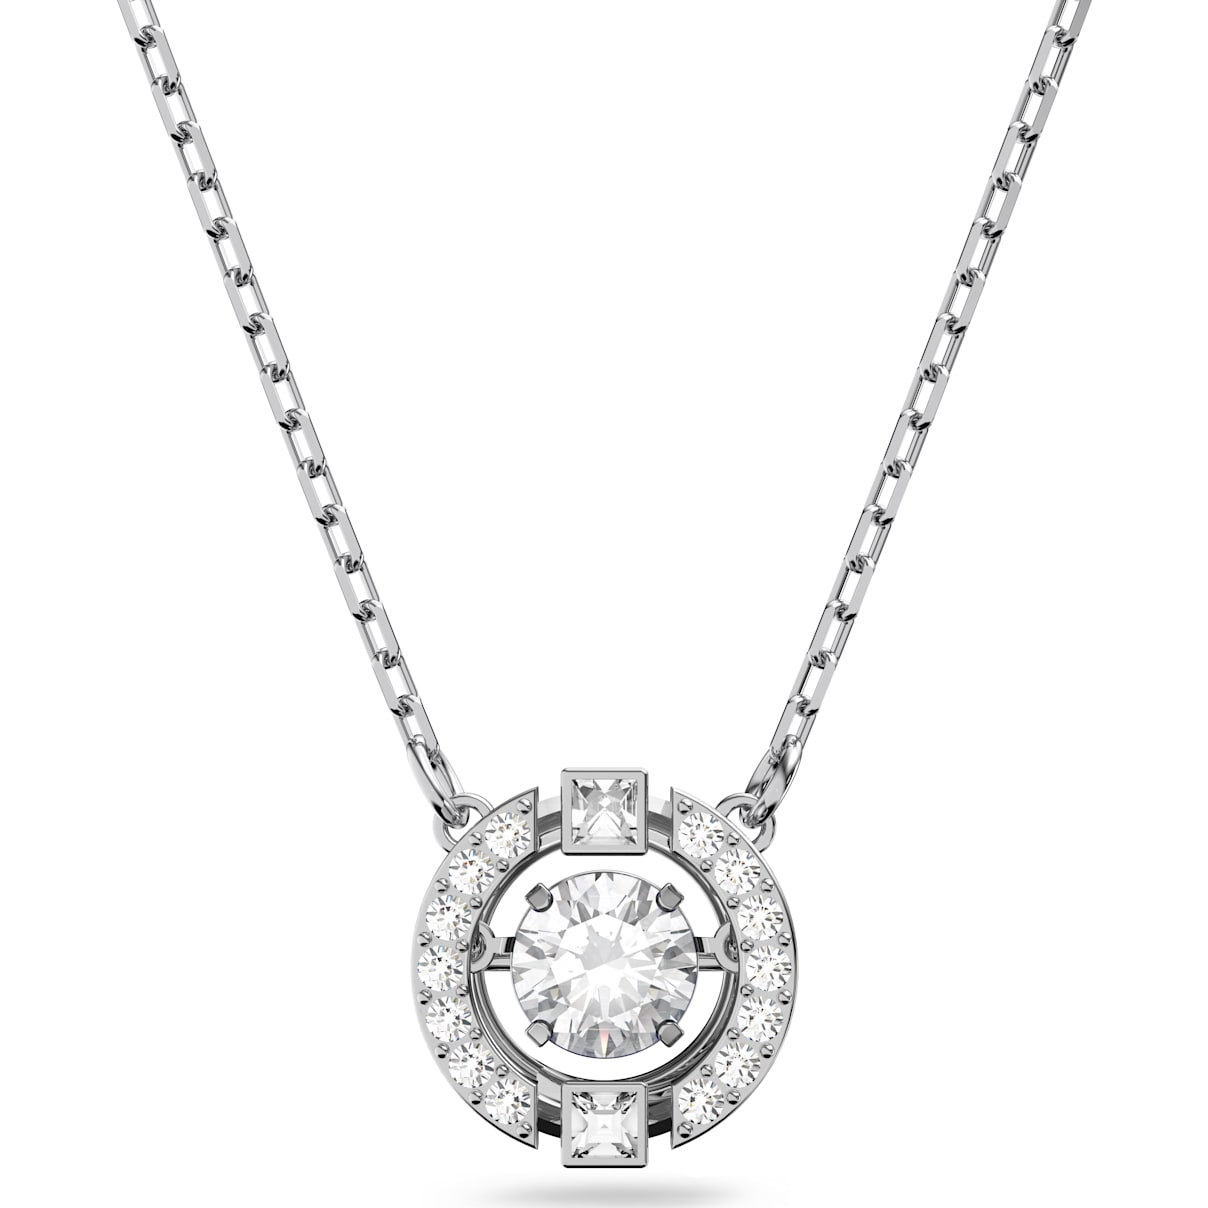 Swarovski Swarovski Sparkling Dance Round Necklace, White, Rhodium plated